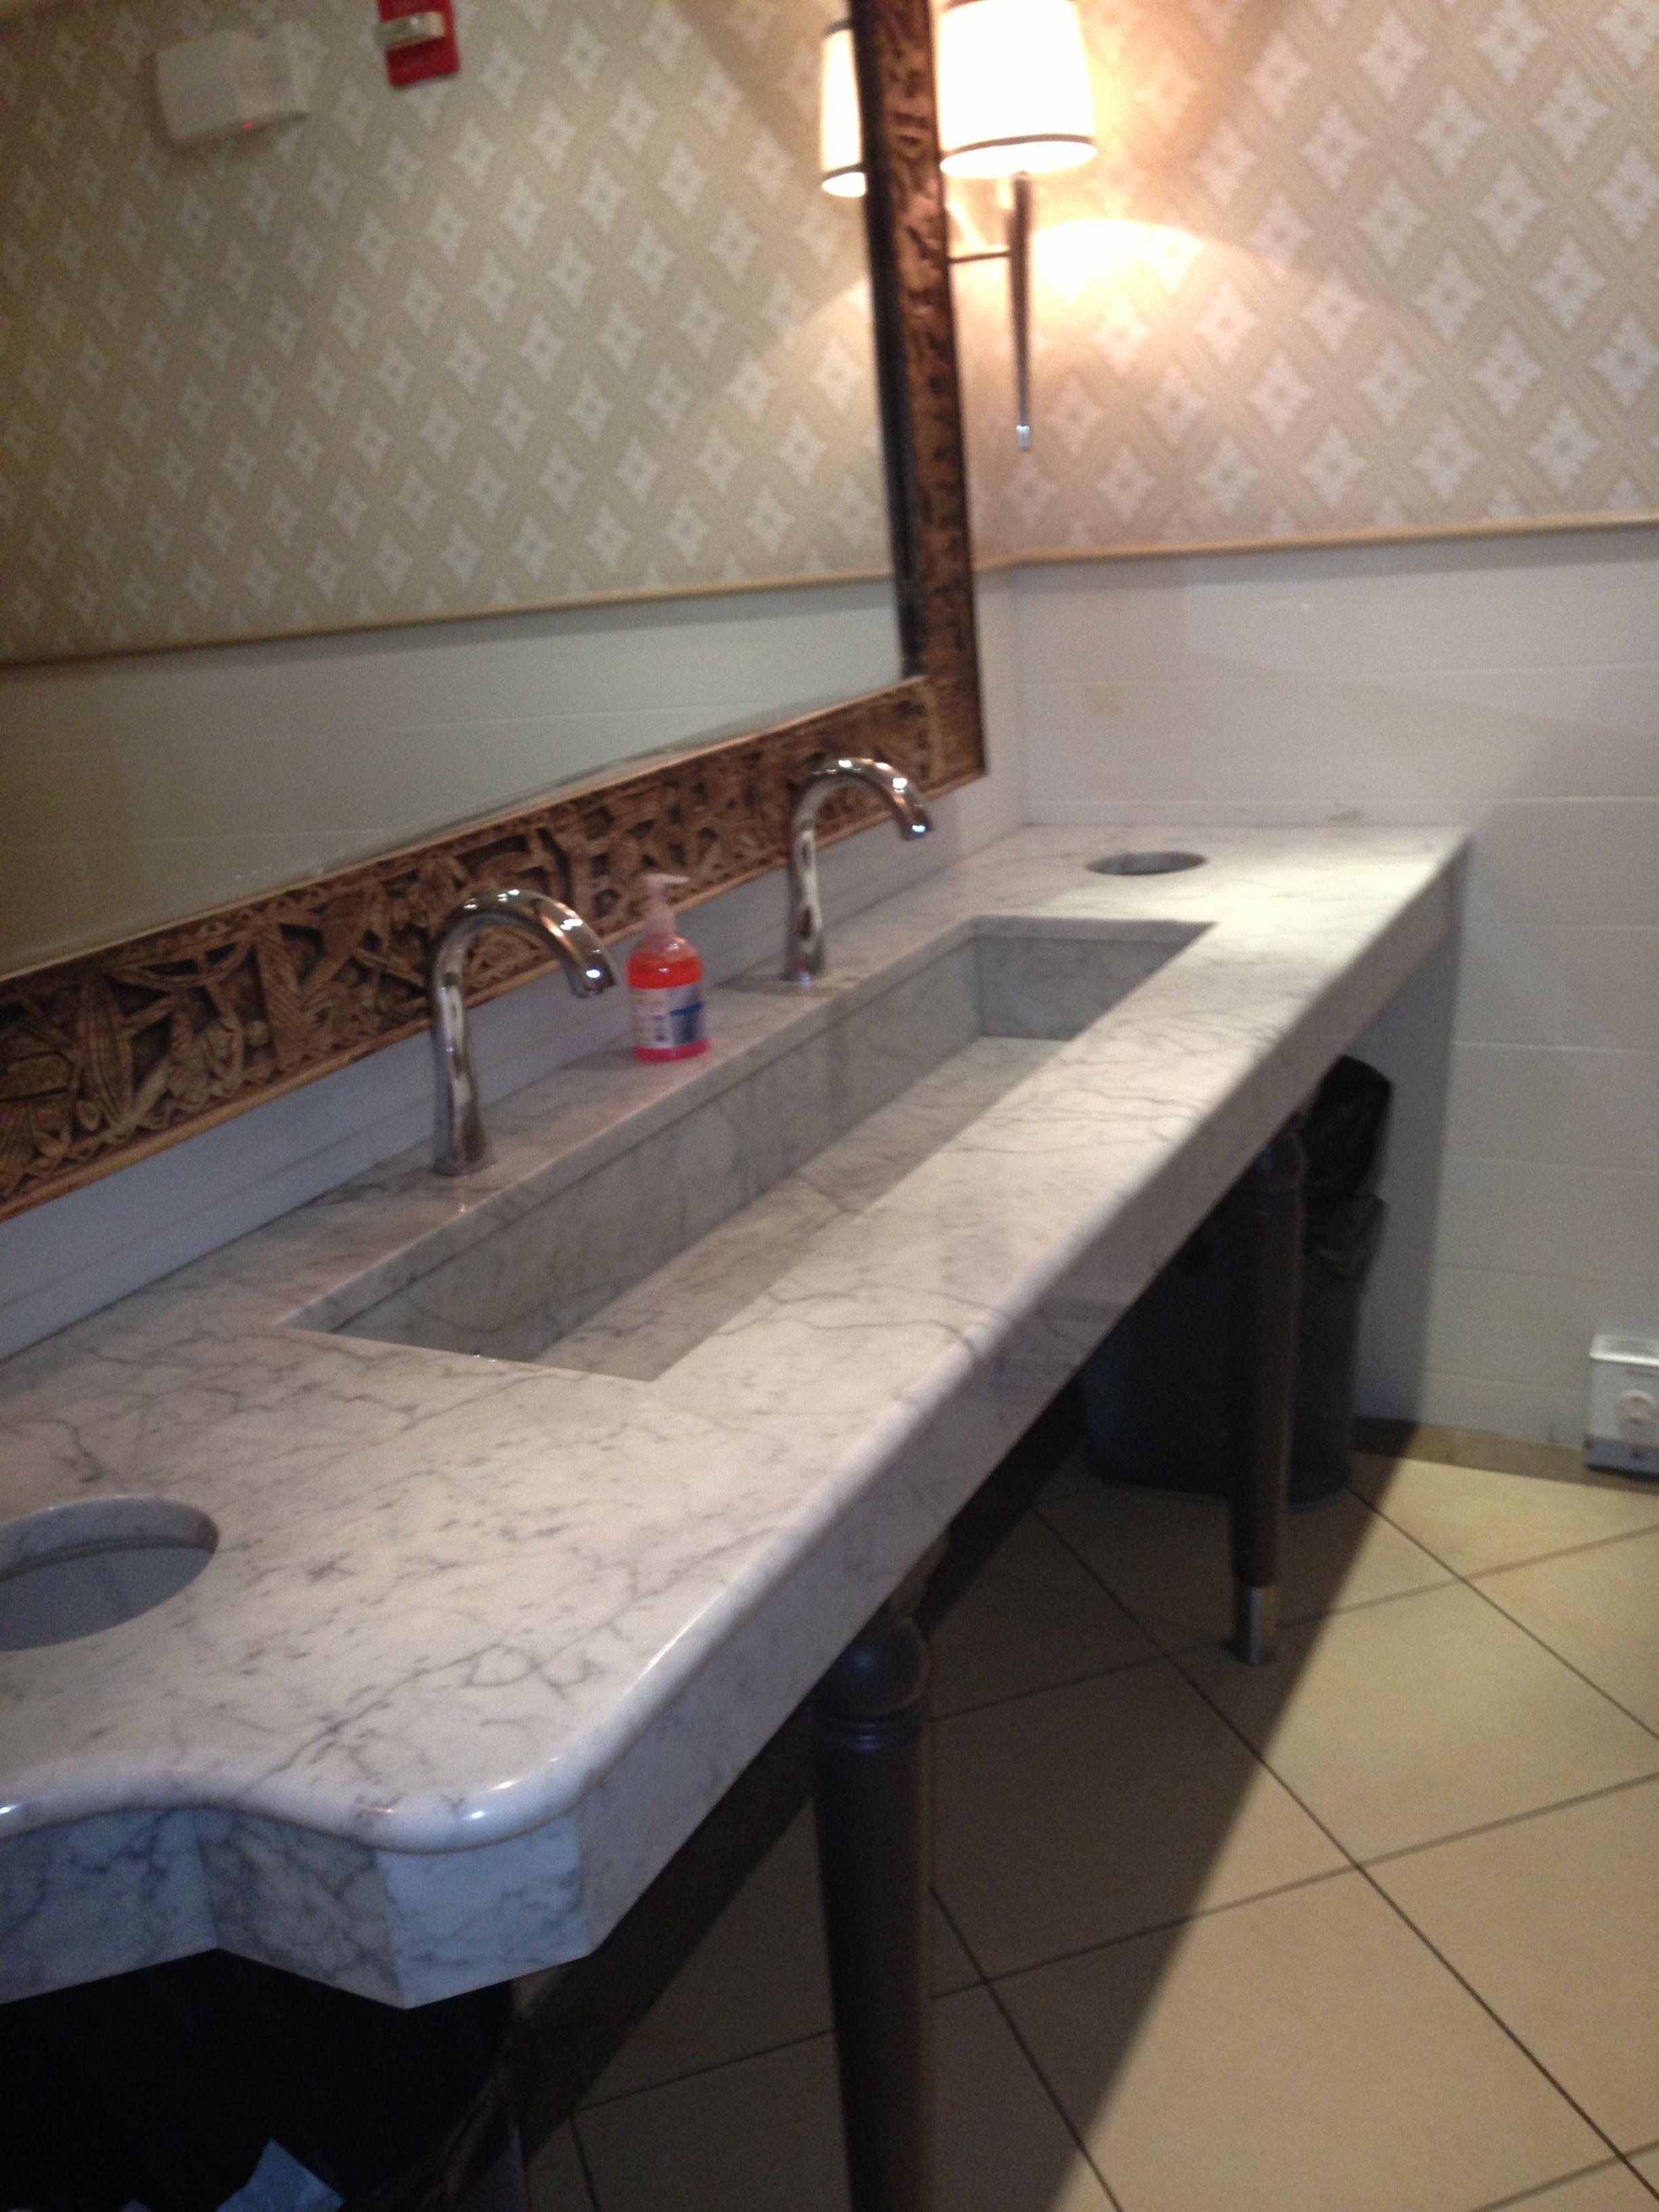 Marble Double Trough Sink Double Trough Sink Marble Sinks Trough Sink [ 3264 x 2448 Pixel ]